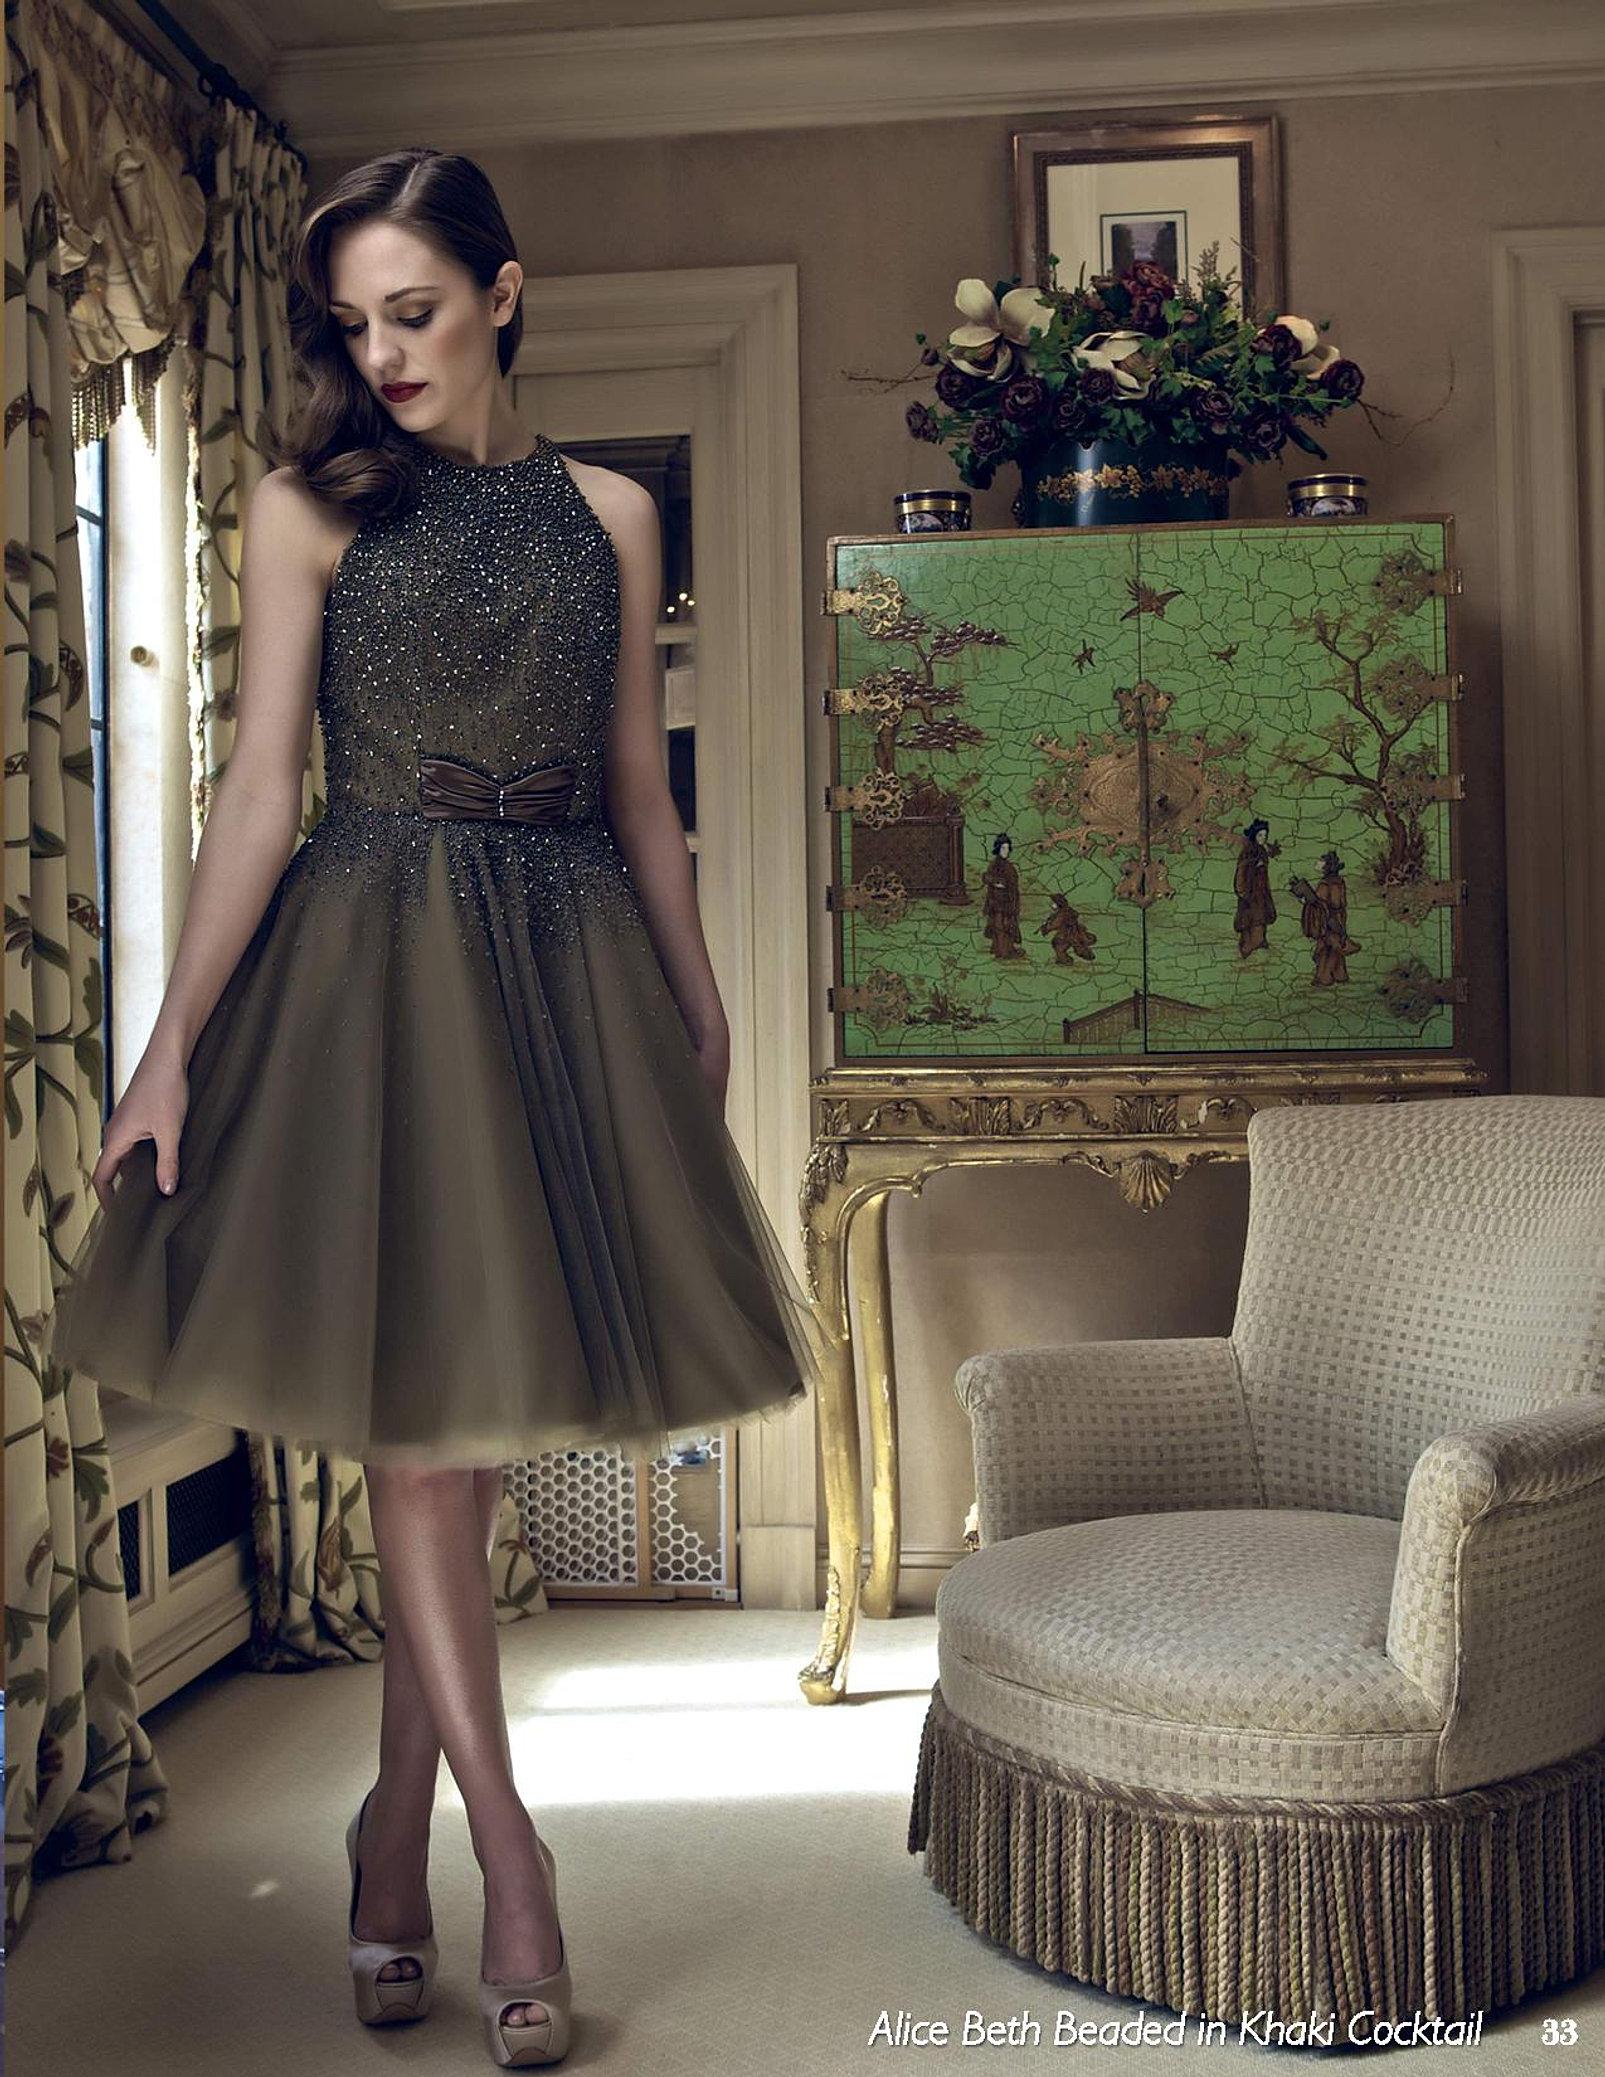 Randi rahm bachelorette dress black